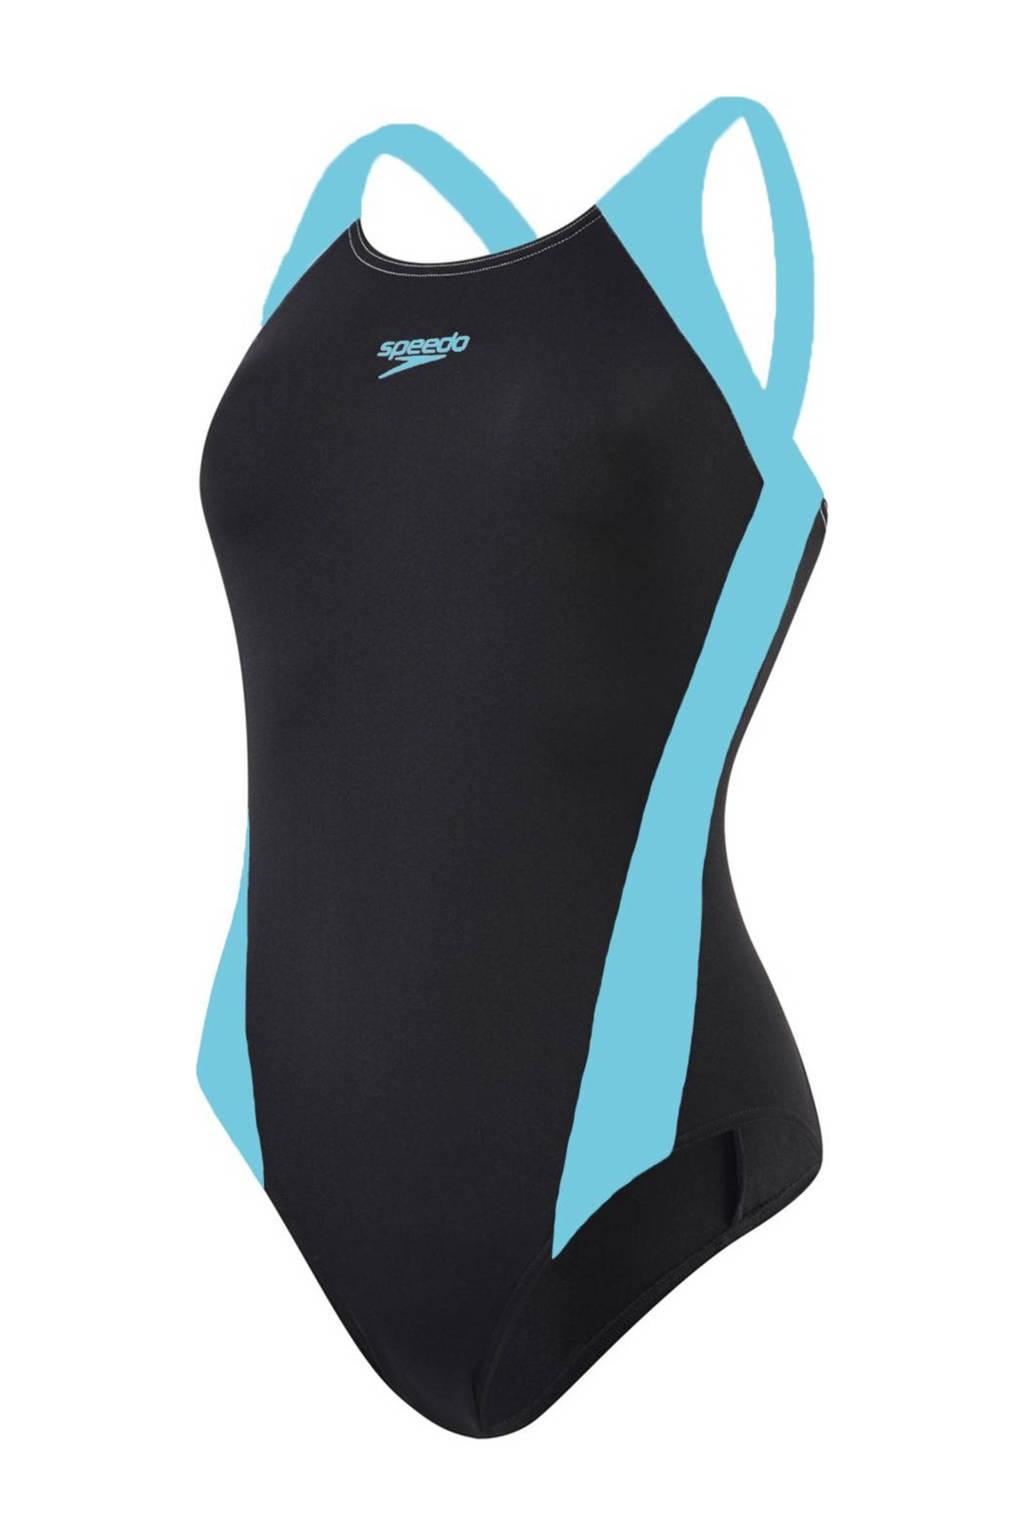 Speedo Endurance+ sportbadpak Splice zwart/turquoise, Zwart/turquoise